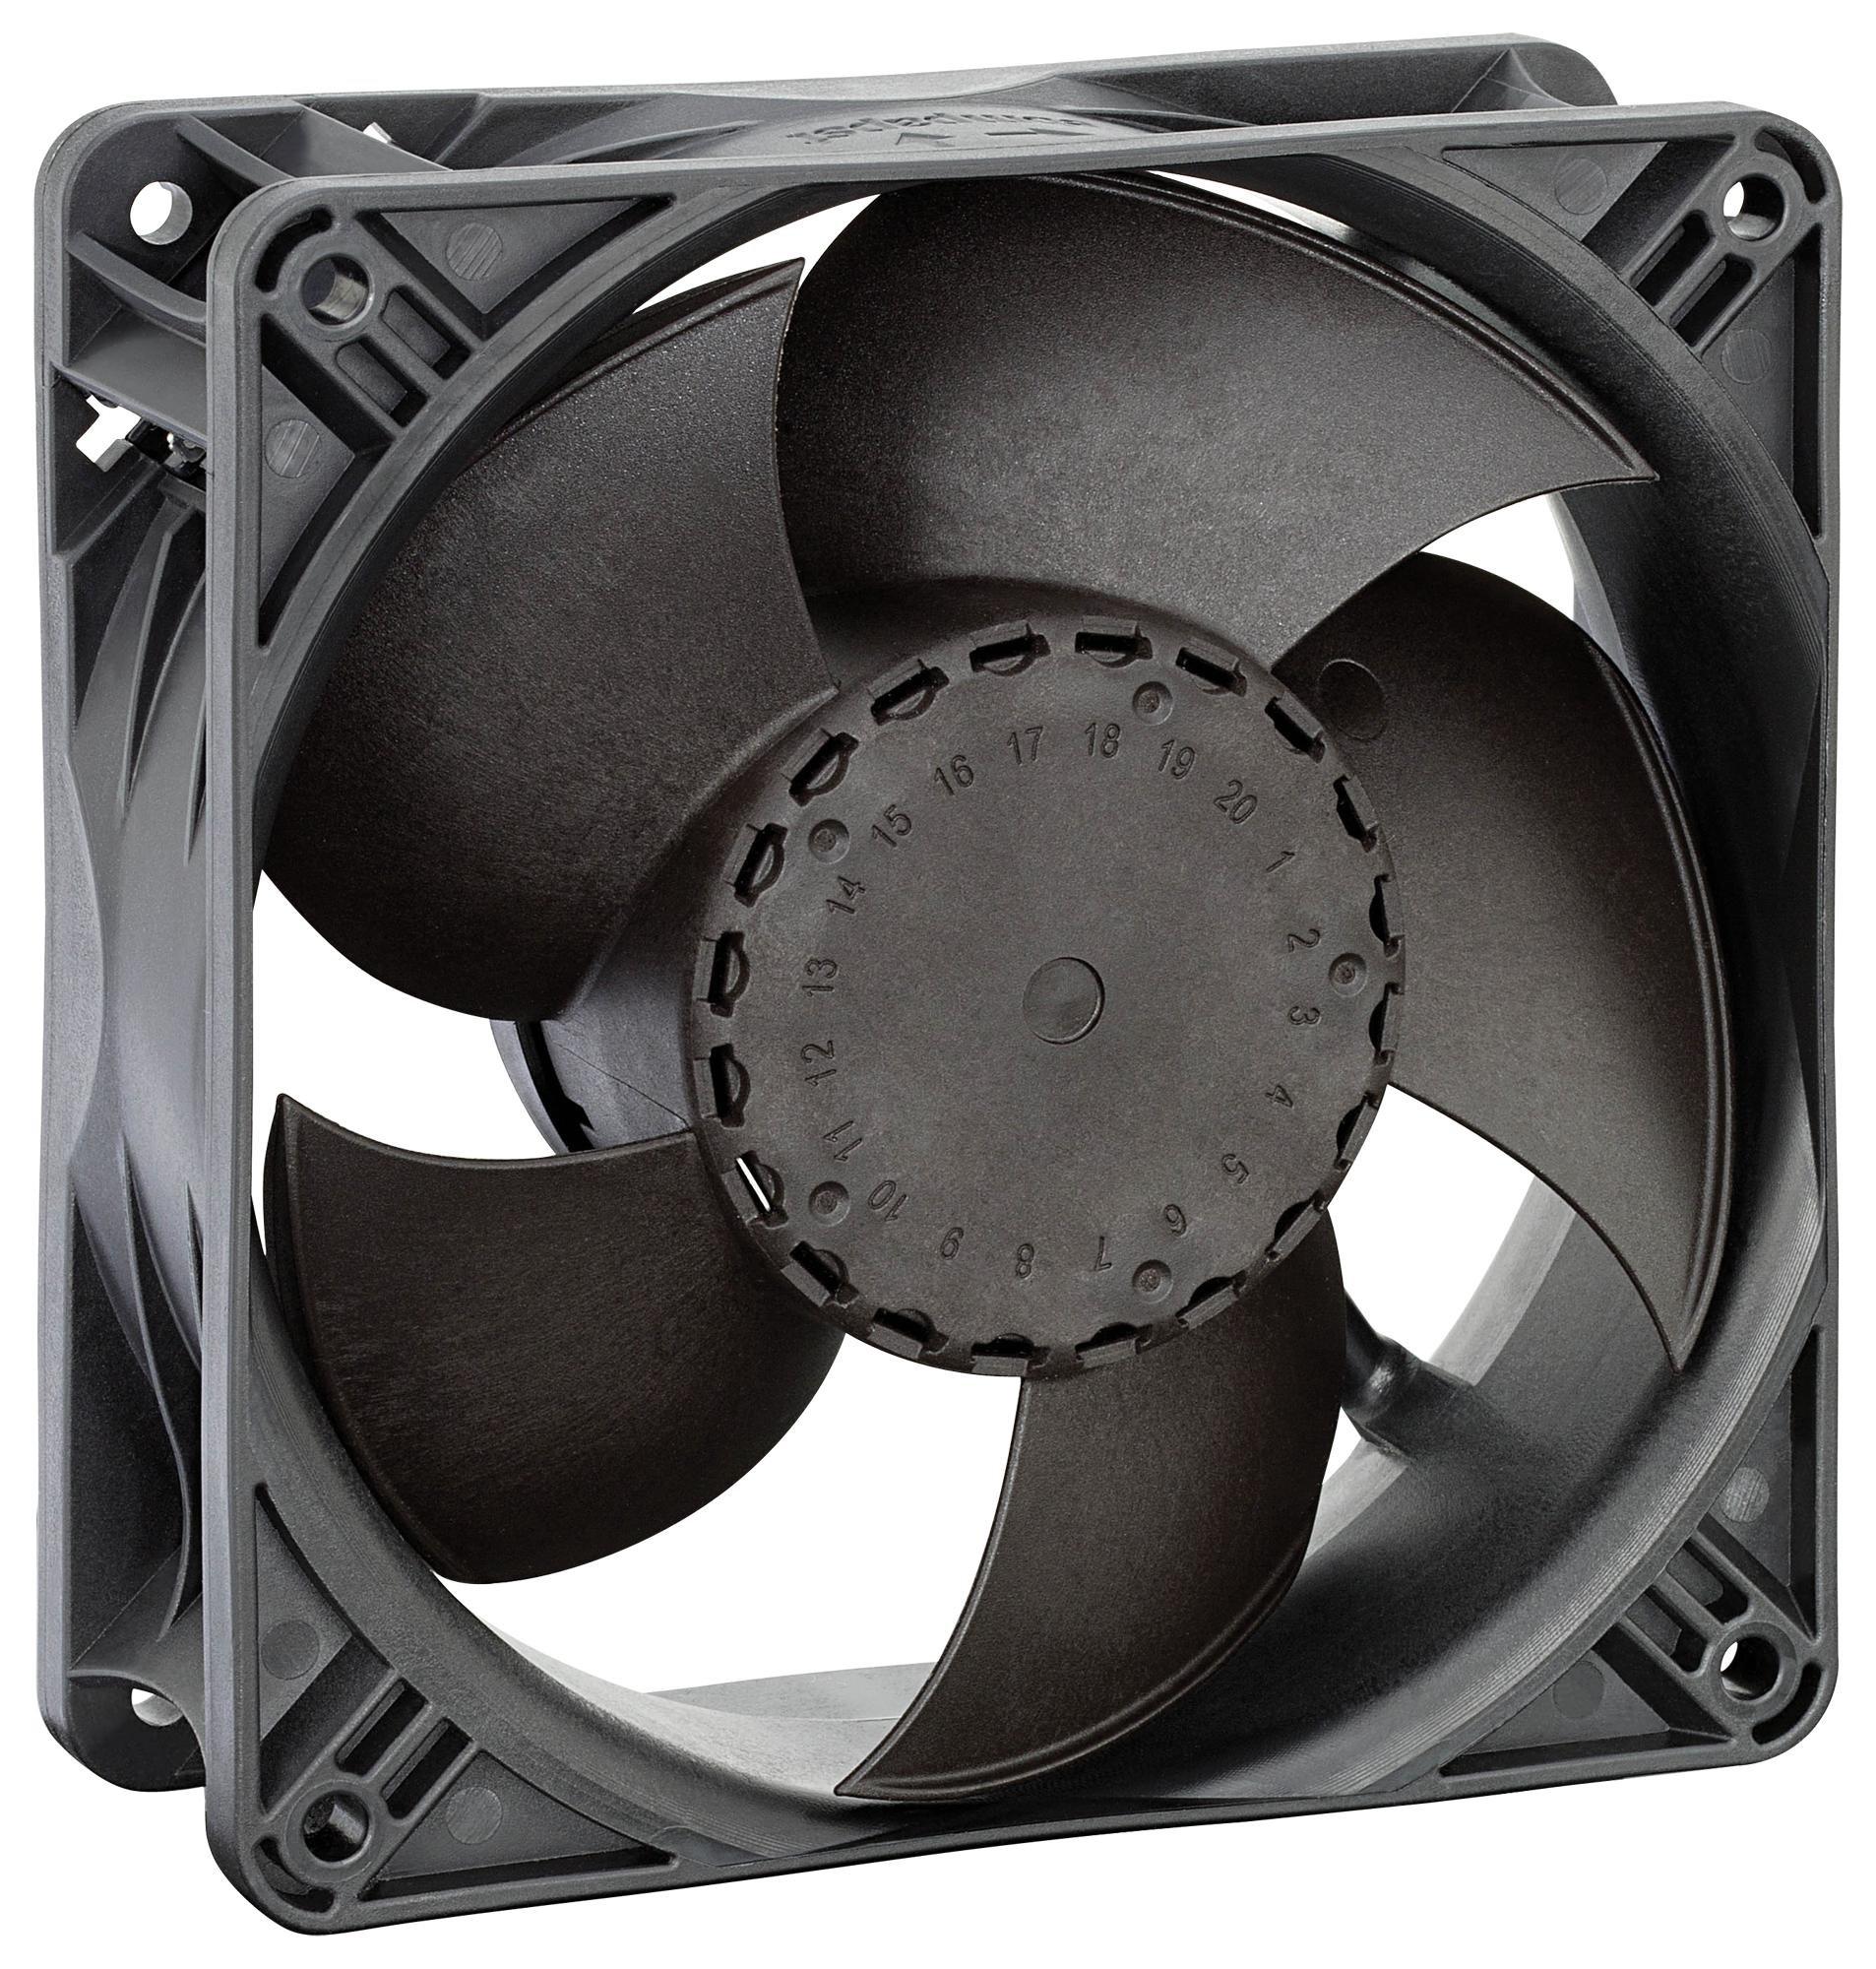 EBM-PAPST ACI4400H Axial Fan, 240 V, AC, 119 mm, 38 mm, 39 dBA, 94 cu.ft/min